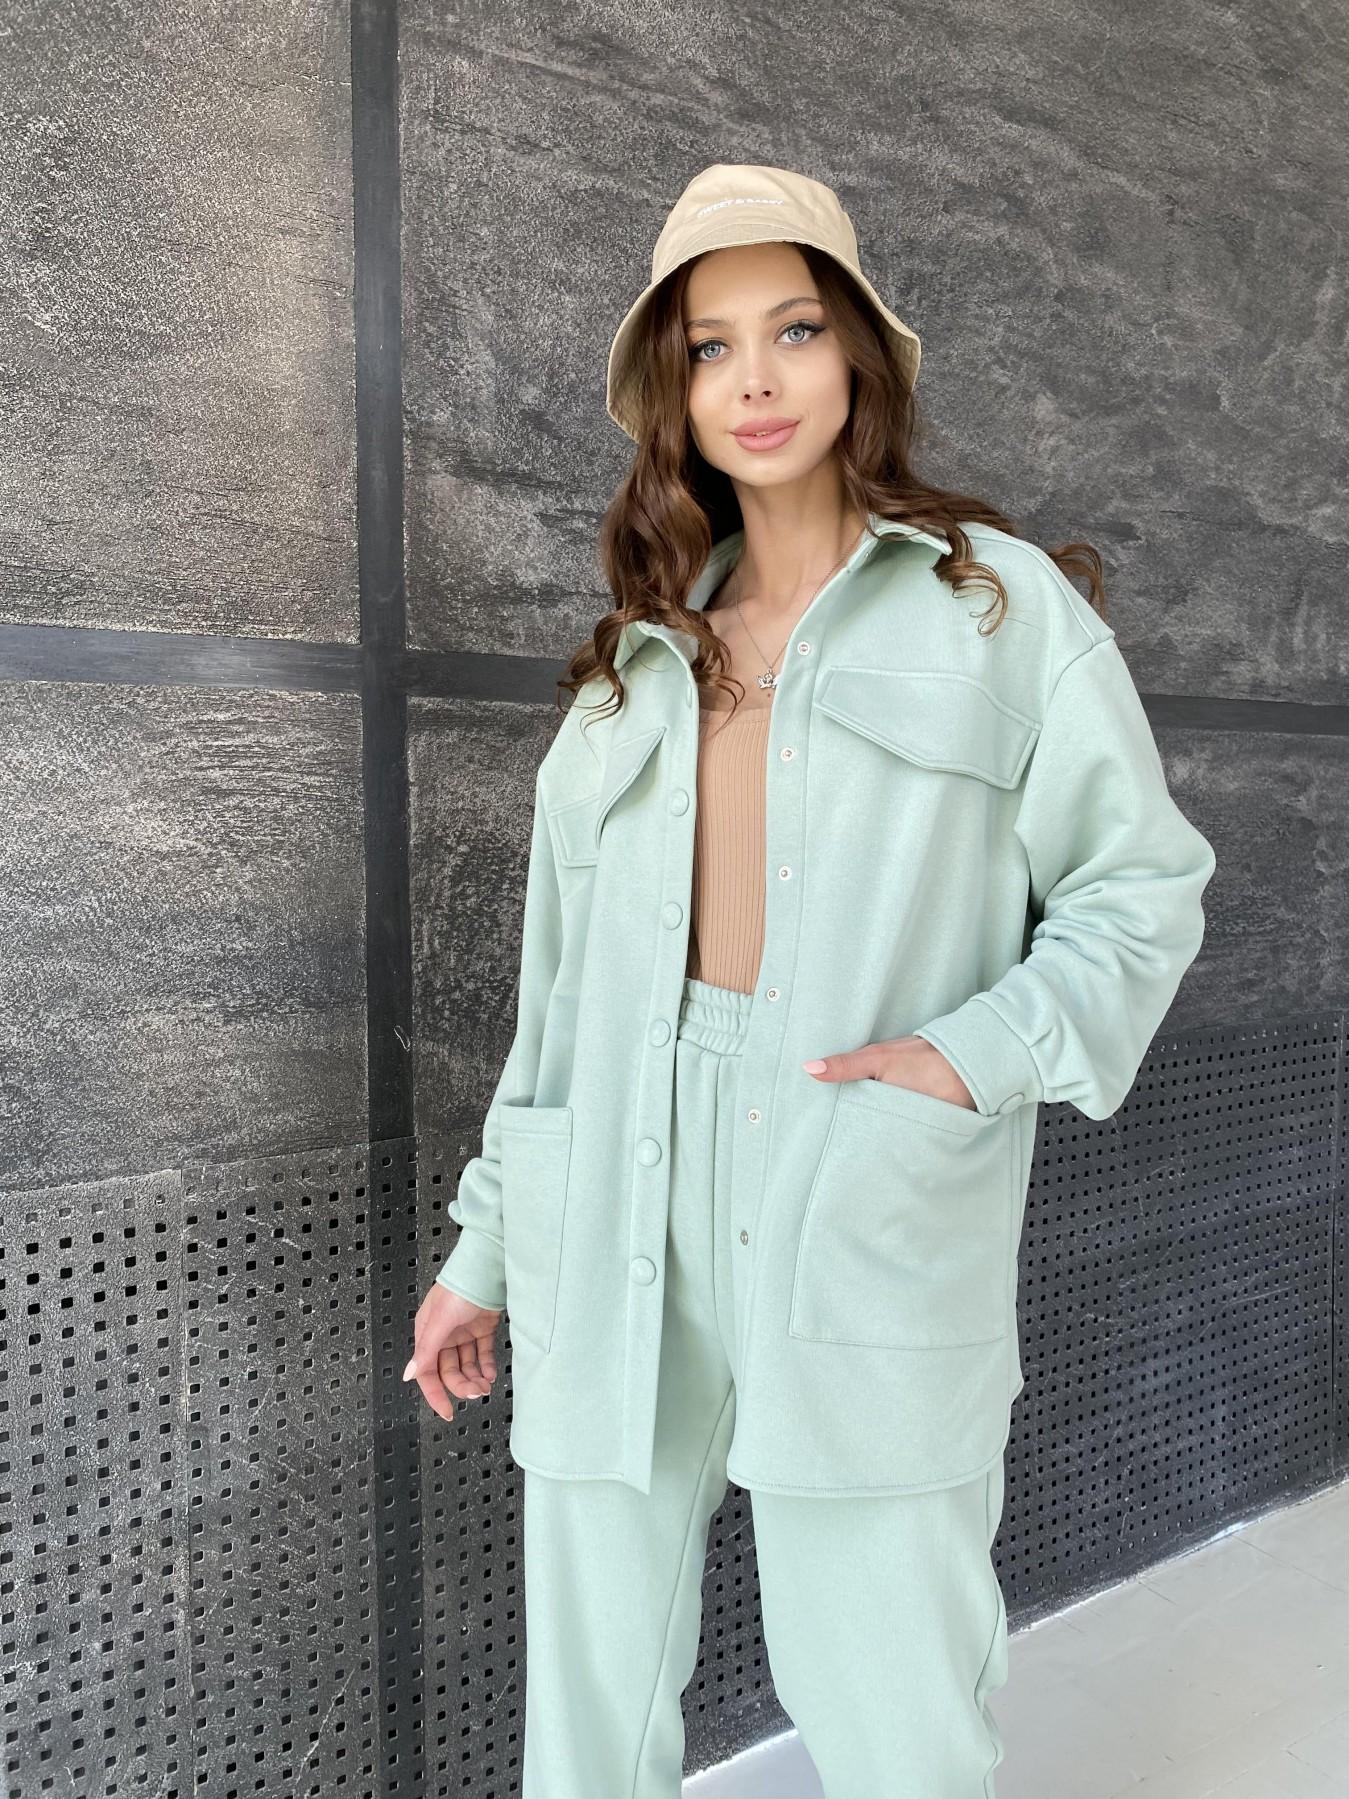 Респект костюм из трикотажа  3х нитка 11055 АРТ. 47576 Цвет: Олива Светлая - фото 4, интернет магазин tm-modus.ru